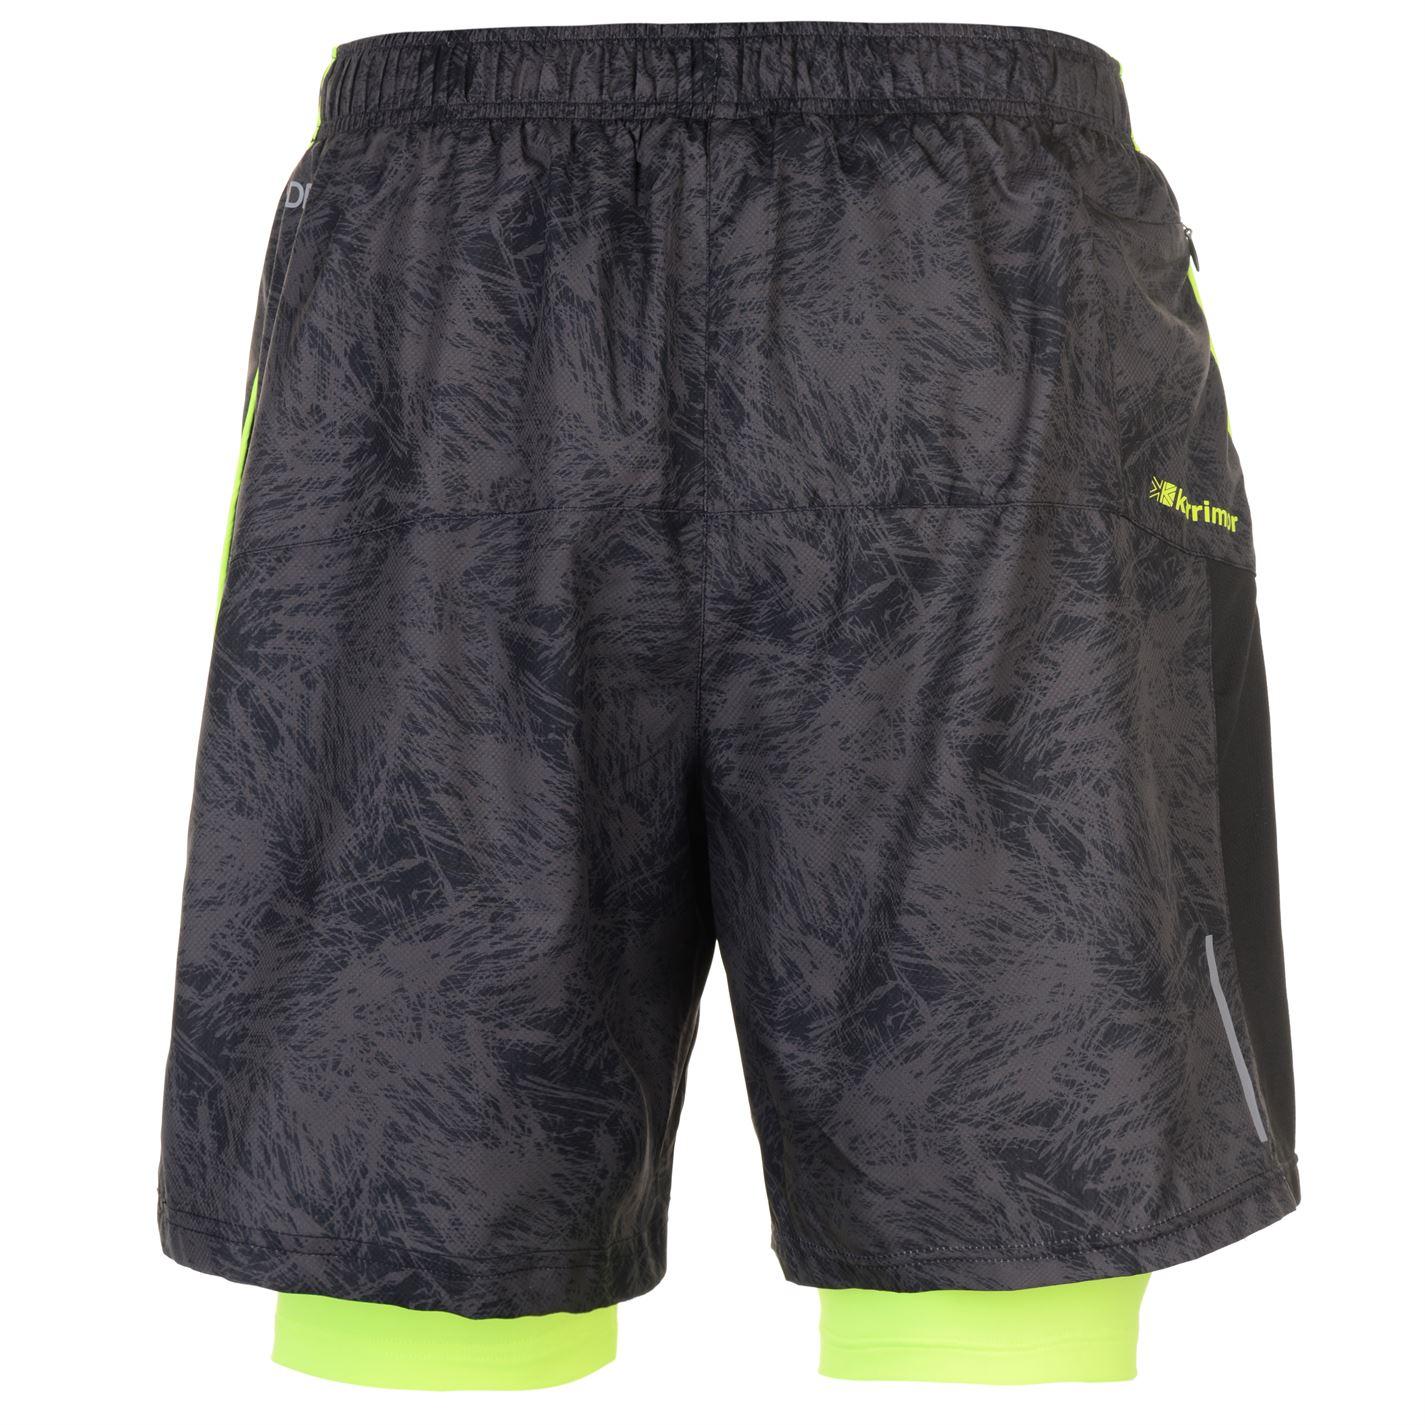 Karrimor-XLite-2in1-Shorts-Performance-Mens thumbnail 13